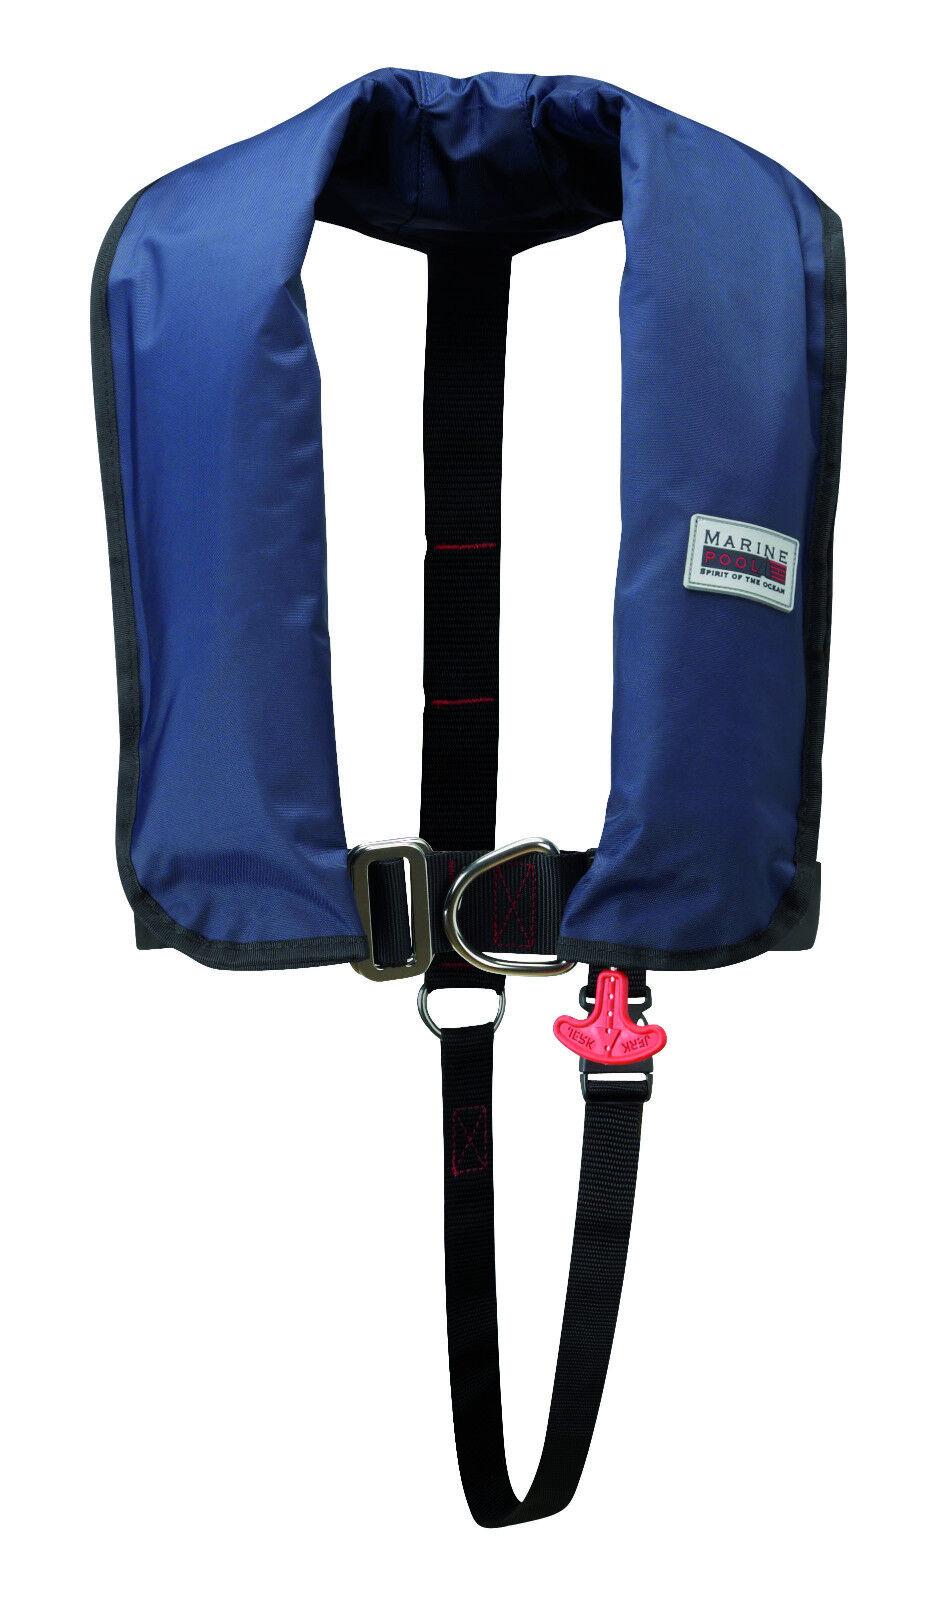 Marinepool Rettungsweste ISO 300 N Classic Automatik Harness NAVY